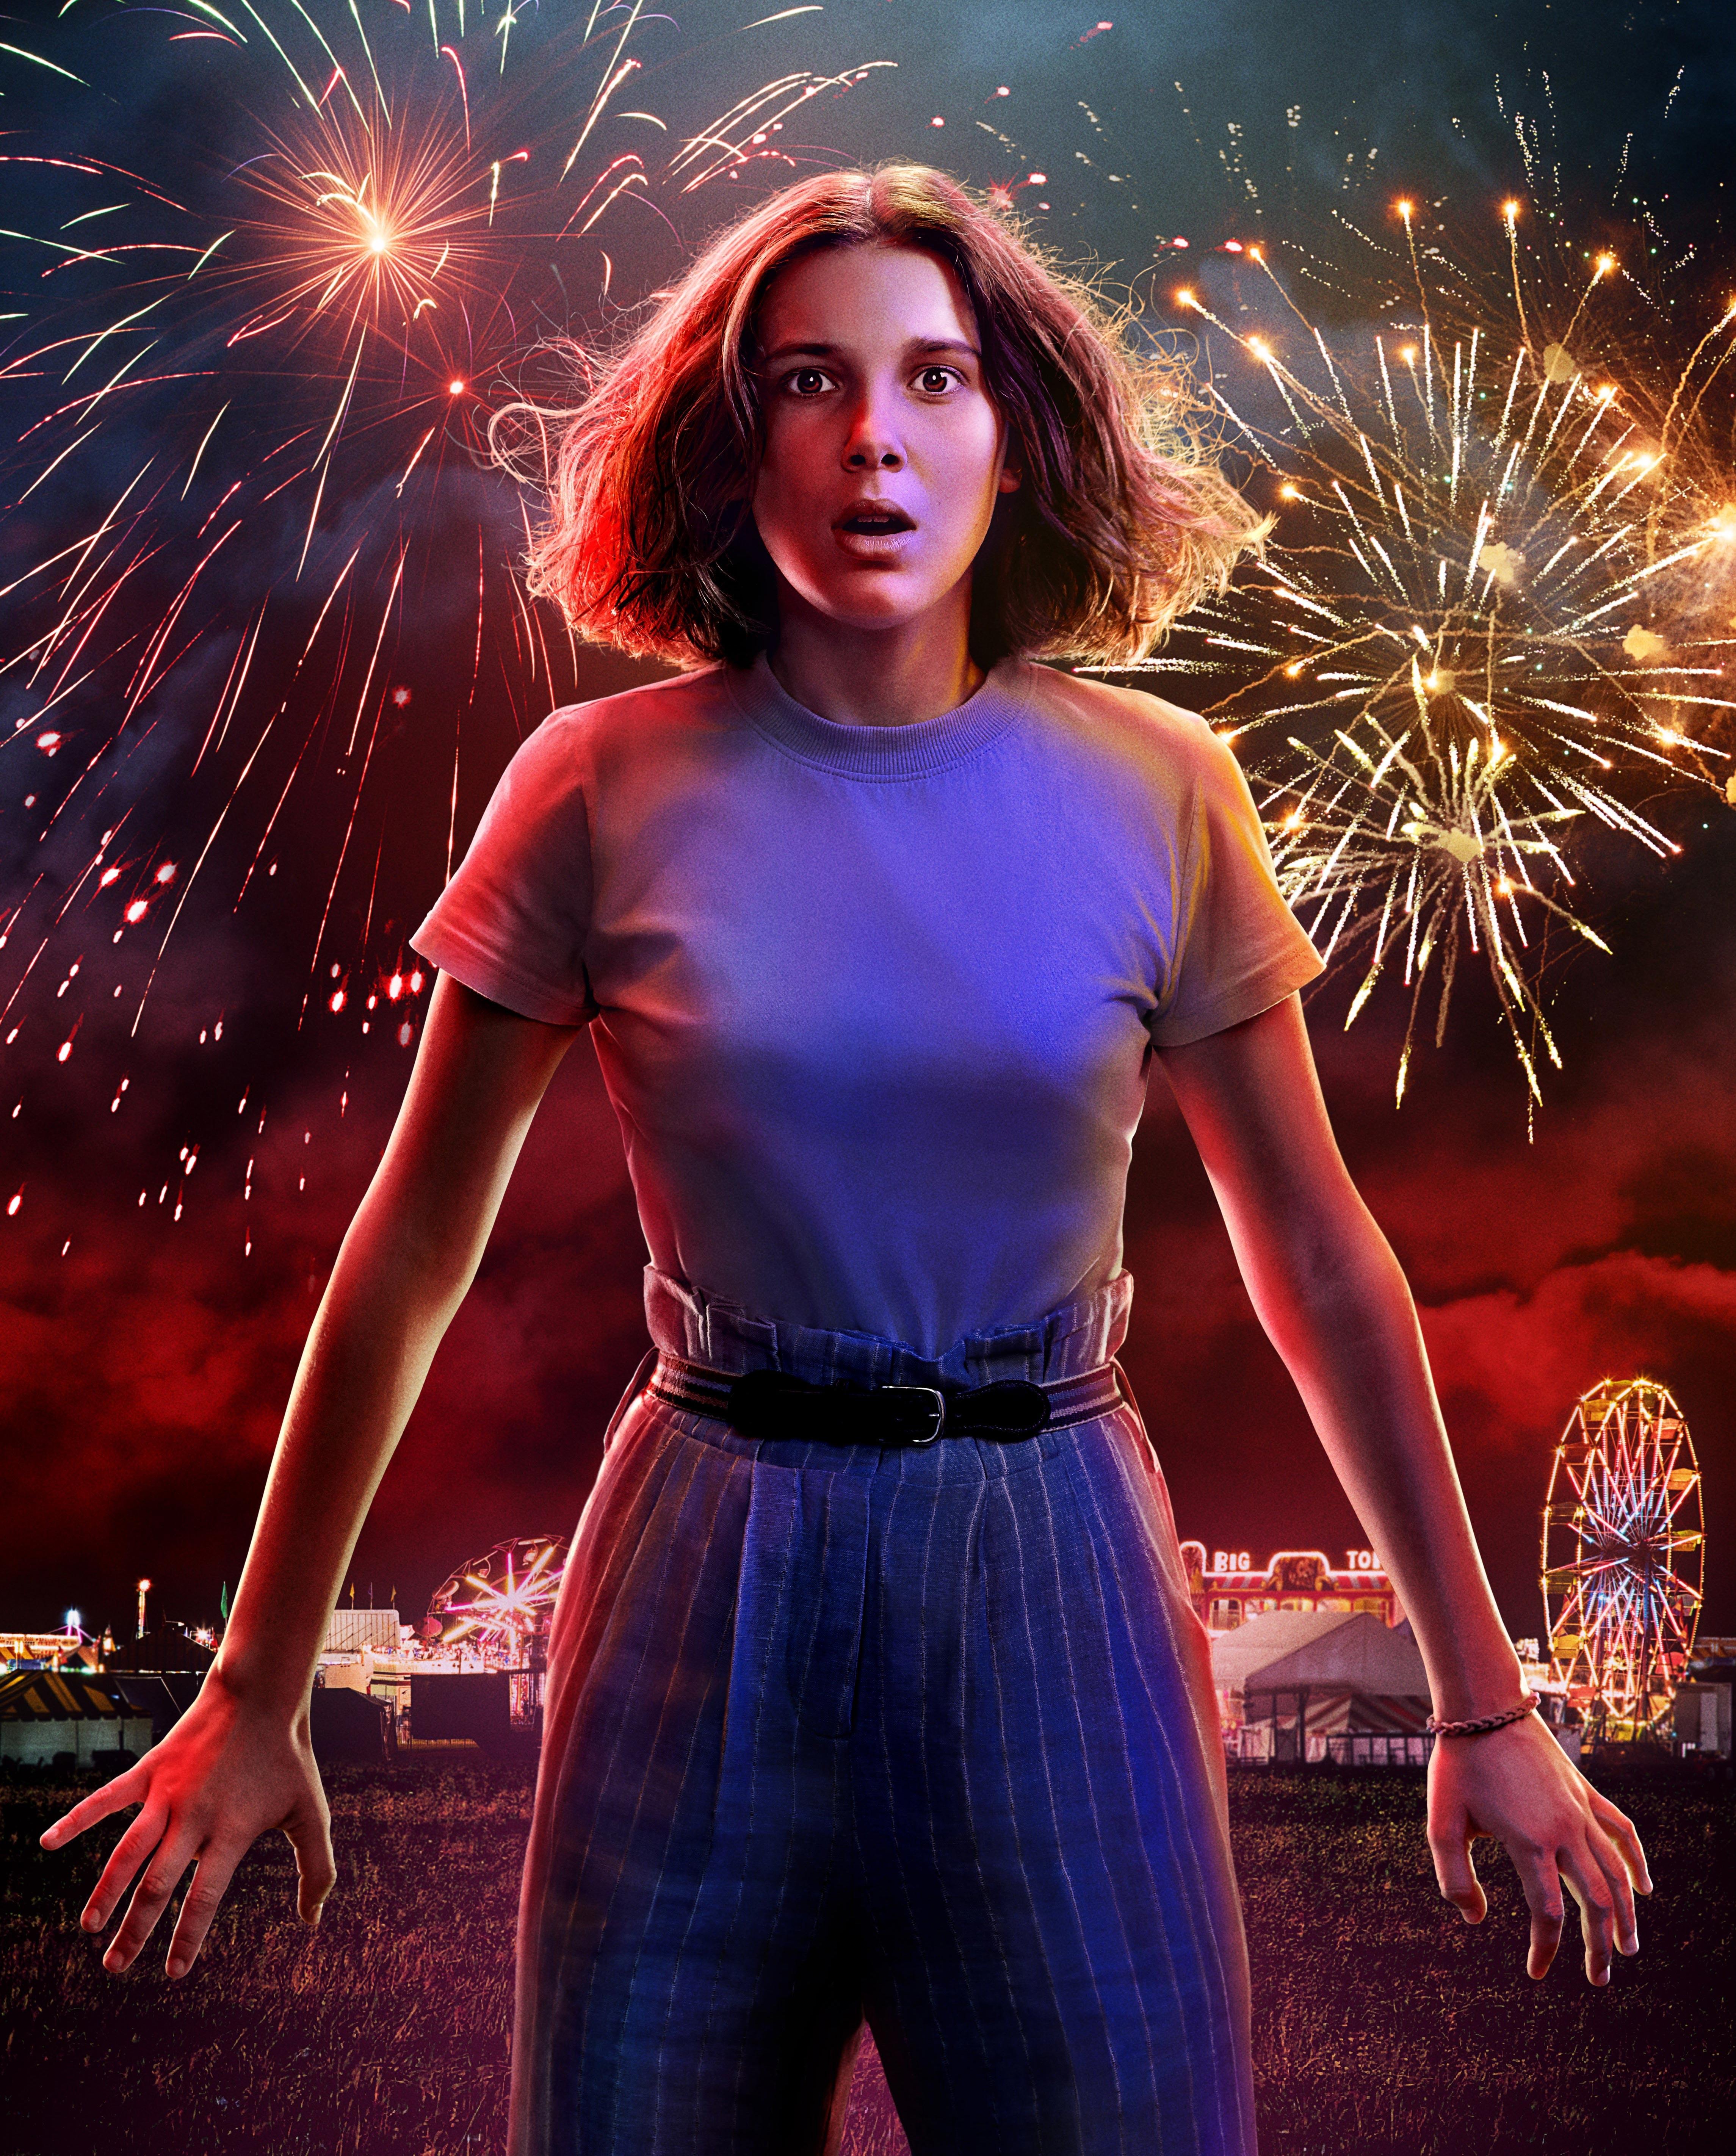 Lucifer Season 3 Hd 4k Wallpaper: Millie Bobby Brown As Eleven Stranger Things 3 Poster